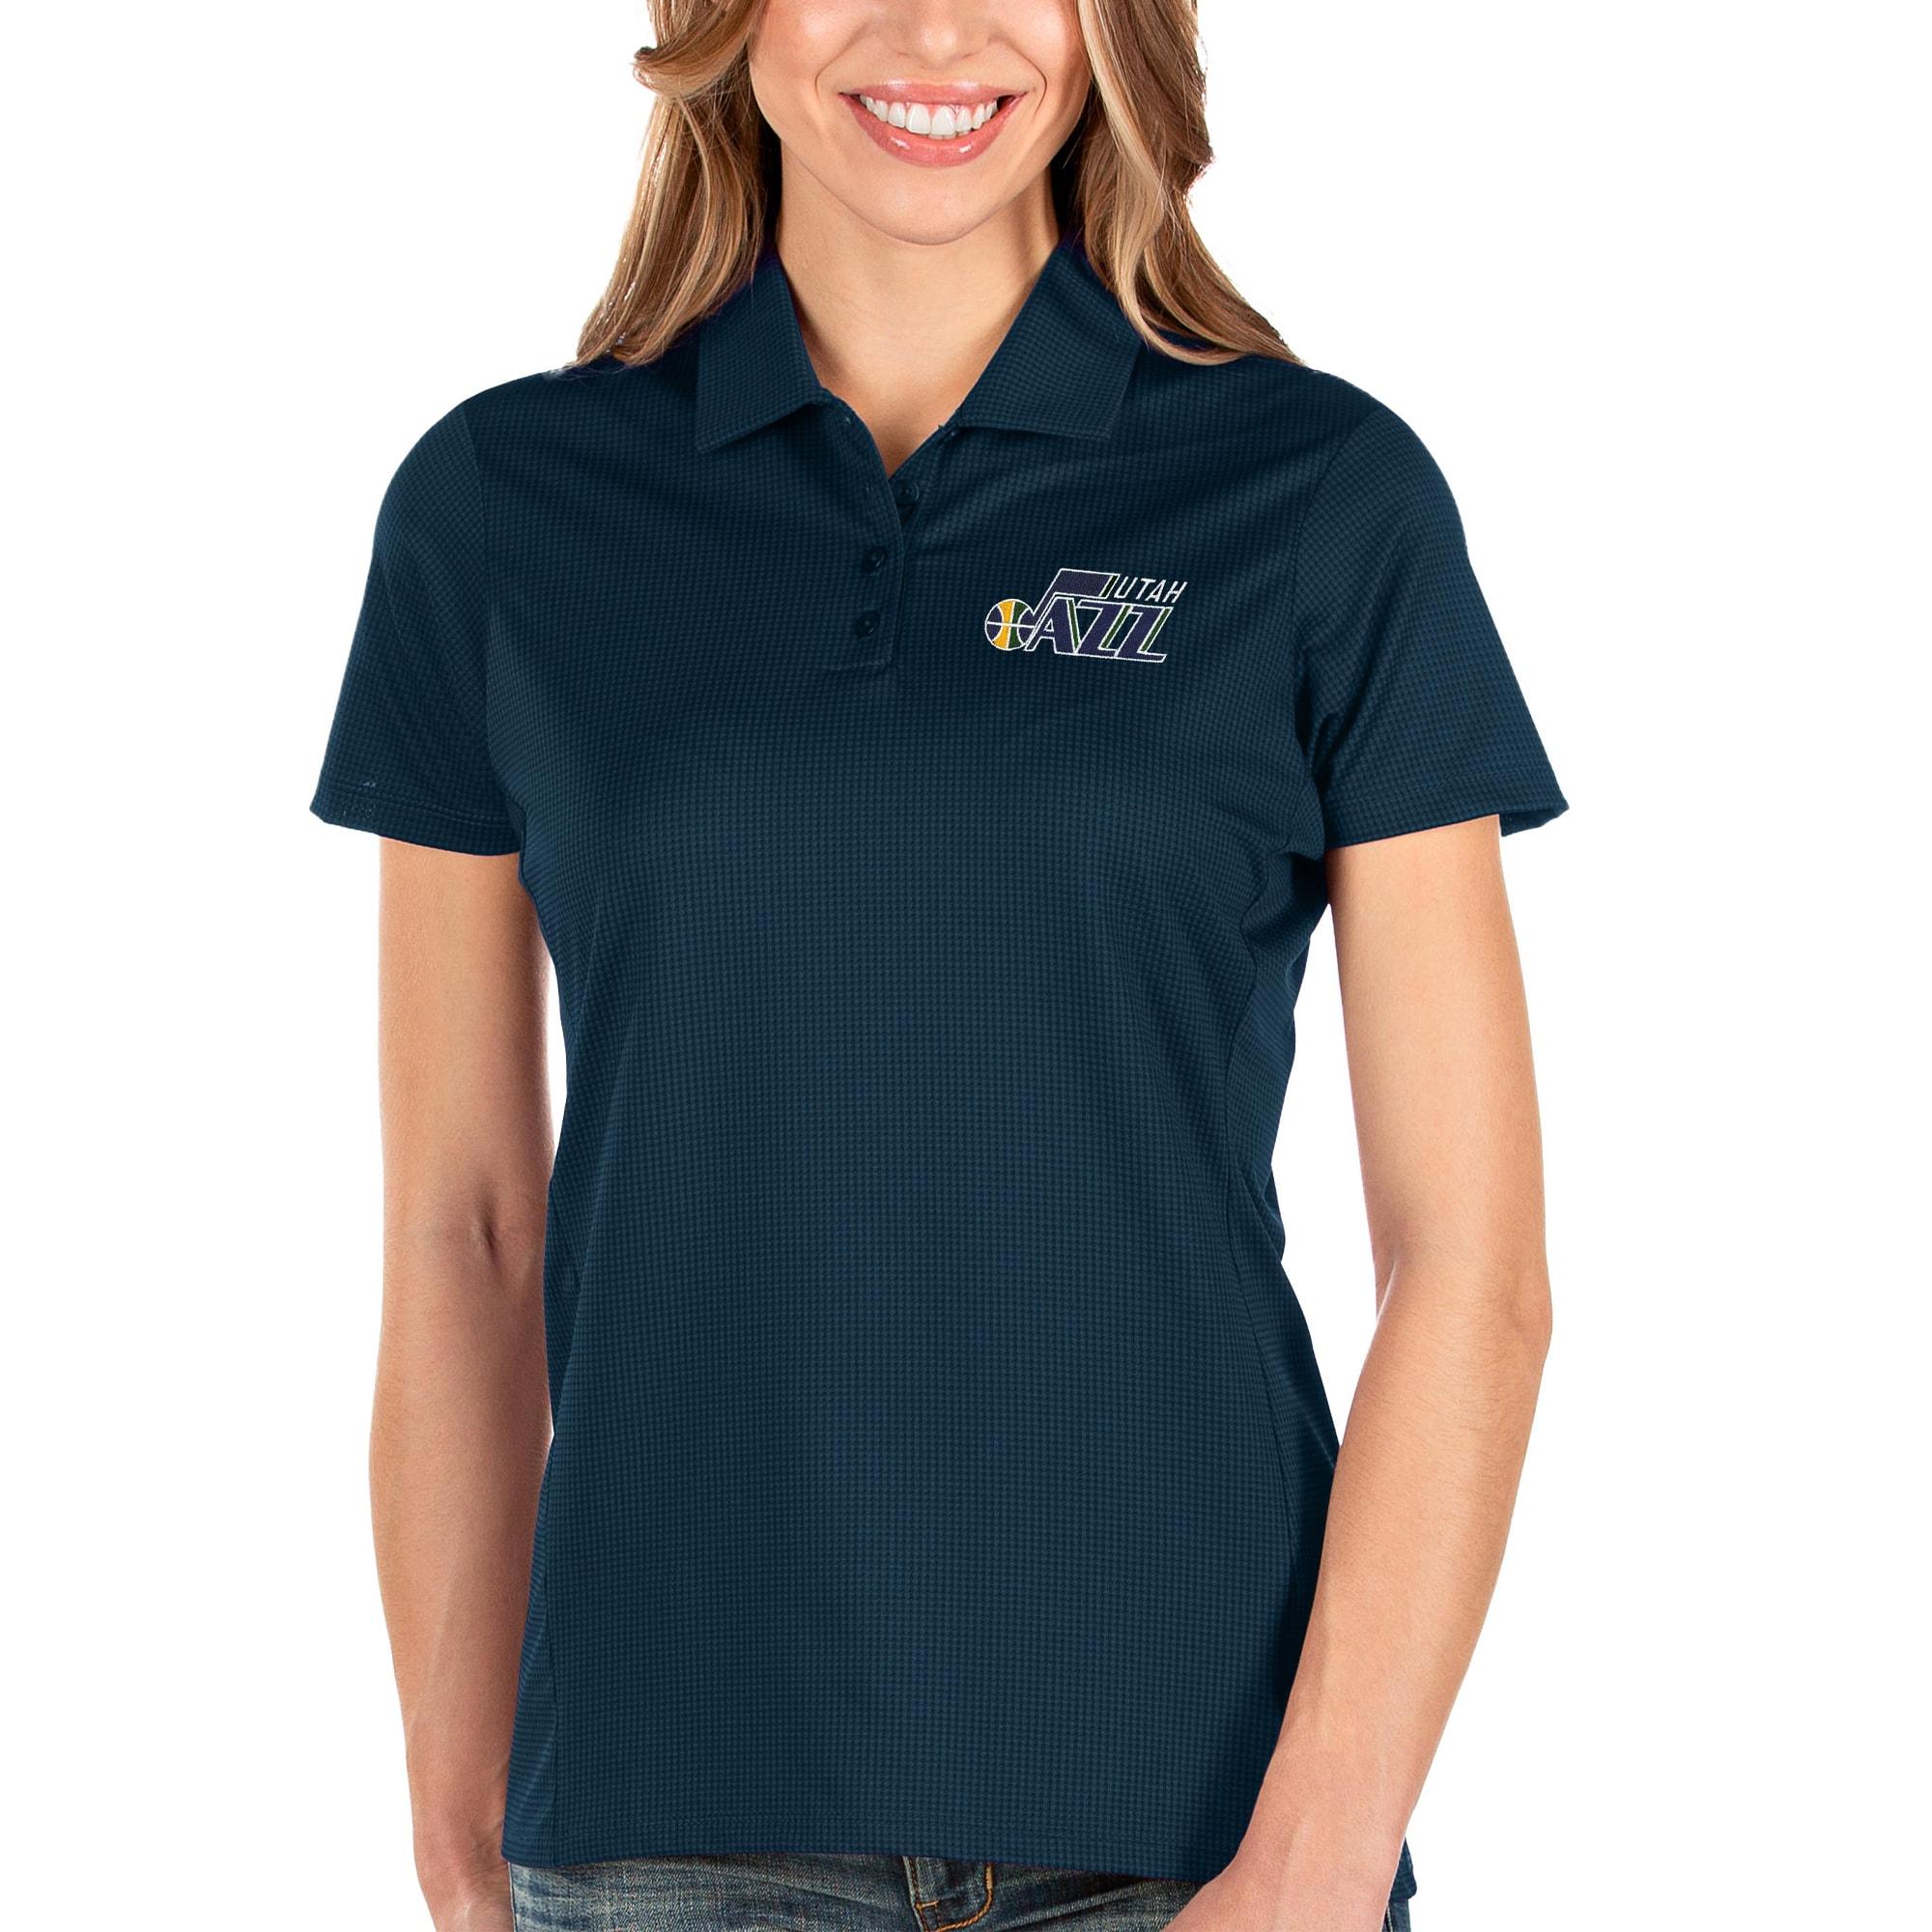 Utah Jazz Antigua Women's Balance Polo - Navy